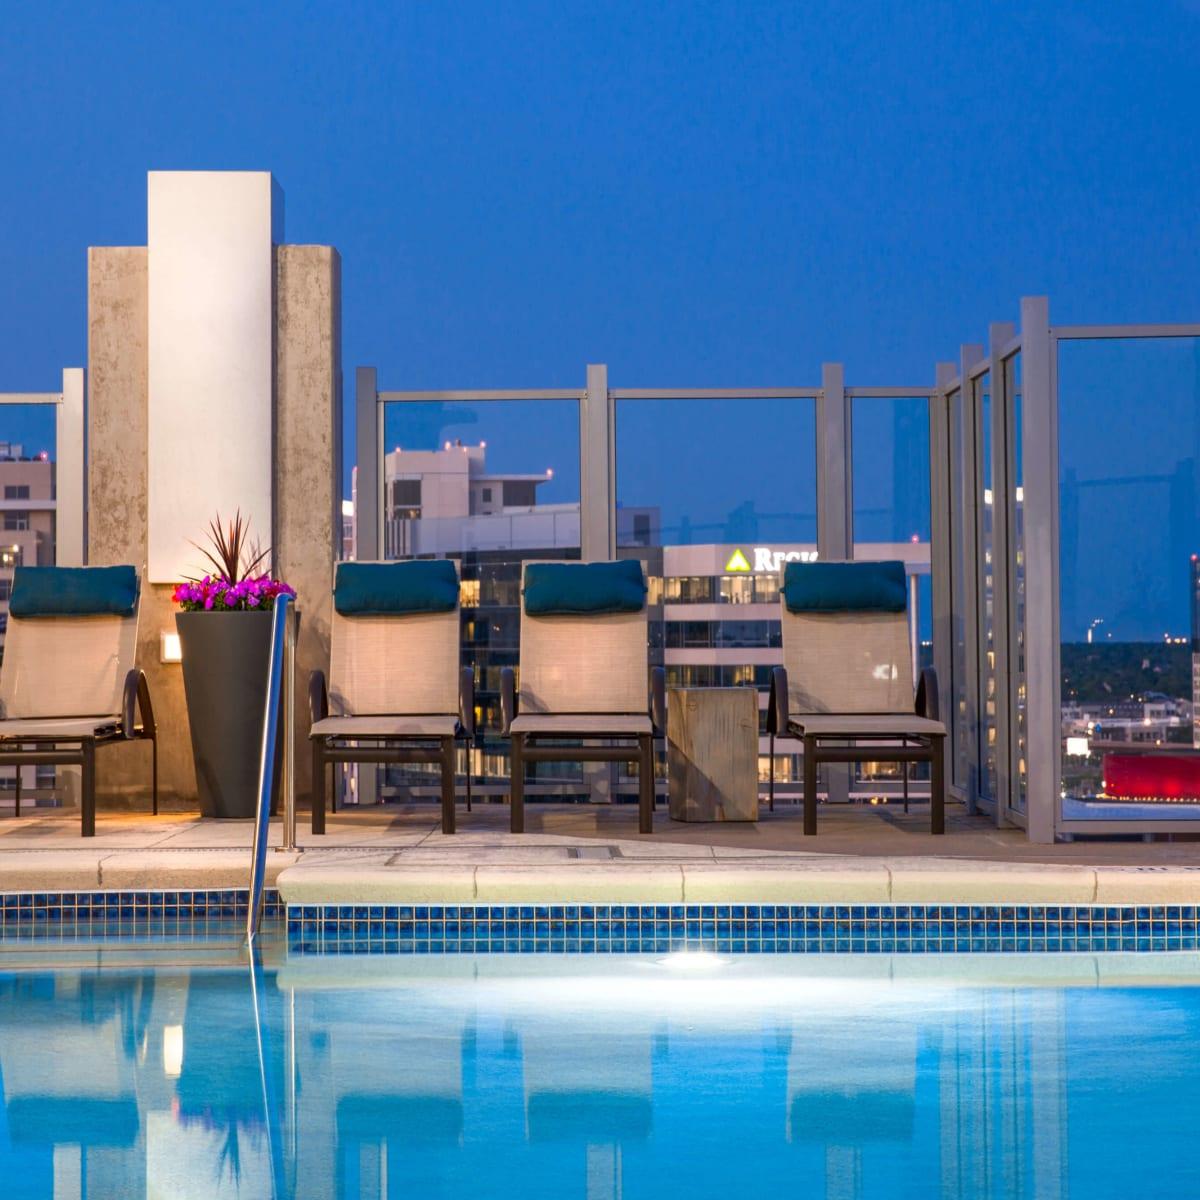 Skyhouse Dallas pool